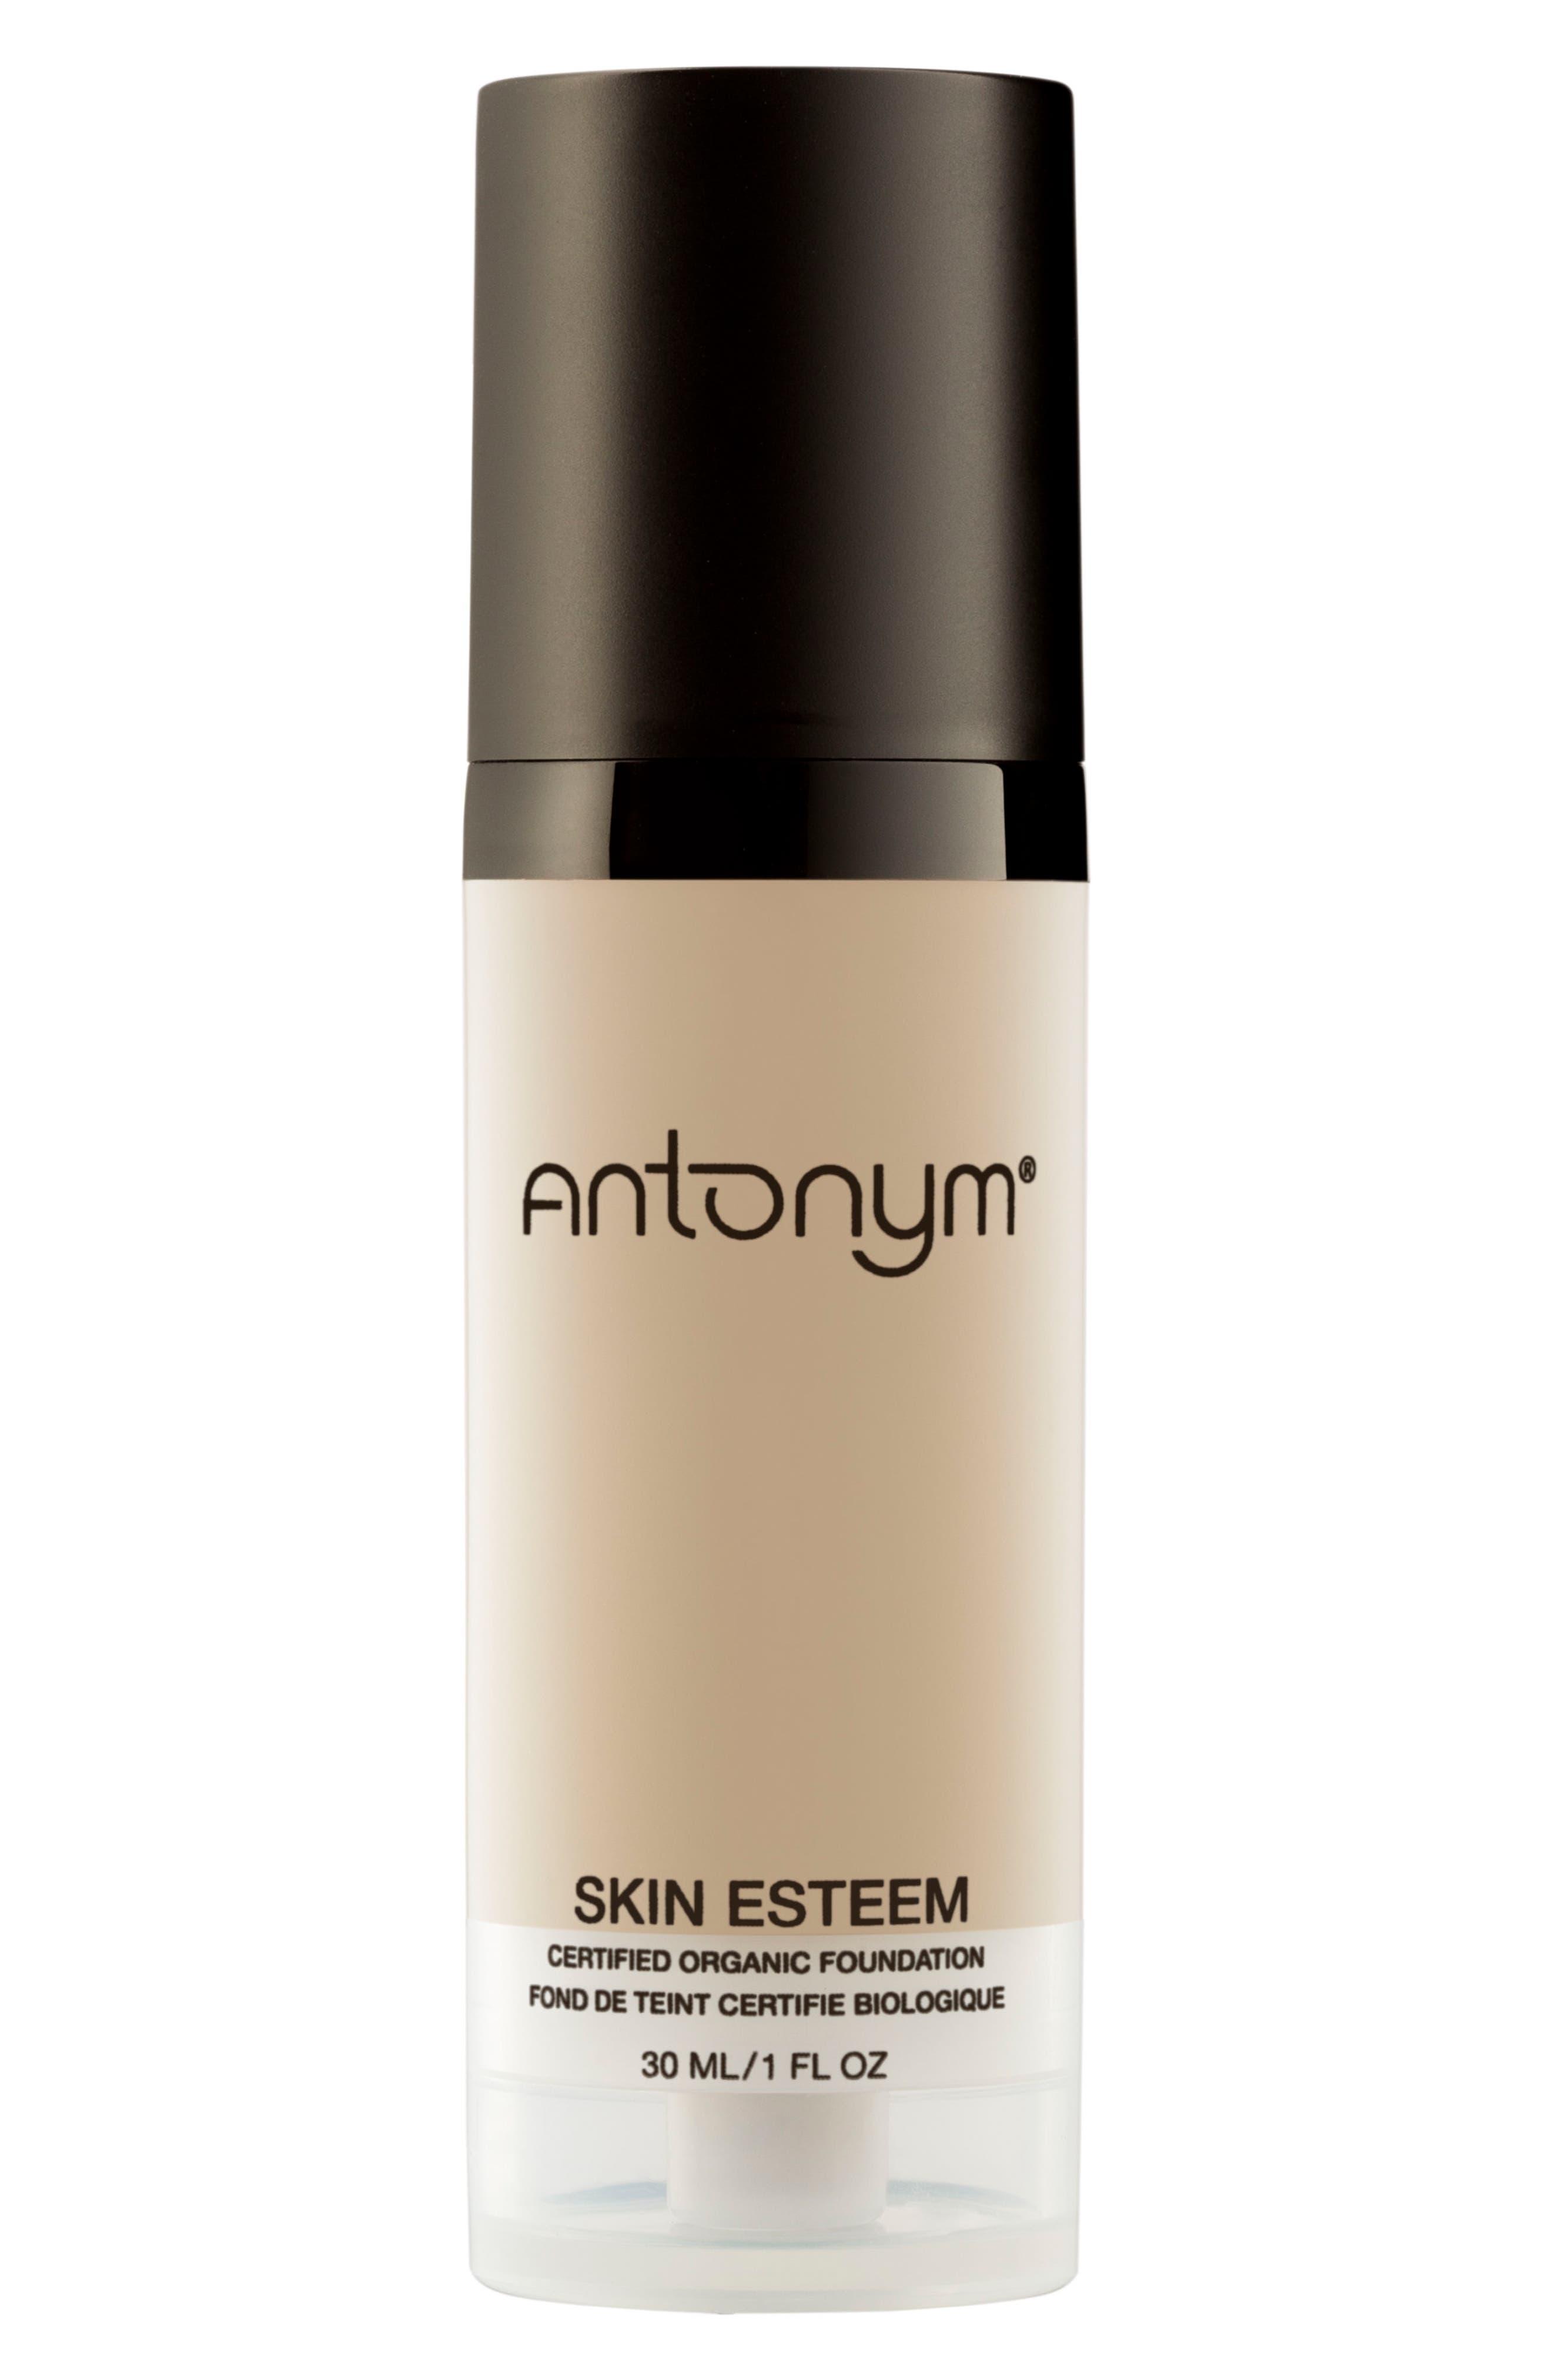 Antonym Skin Esteem Organic Liquid Foundation Nude 1.06 oz/ 30 ml